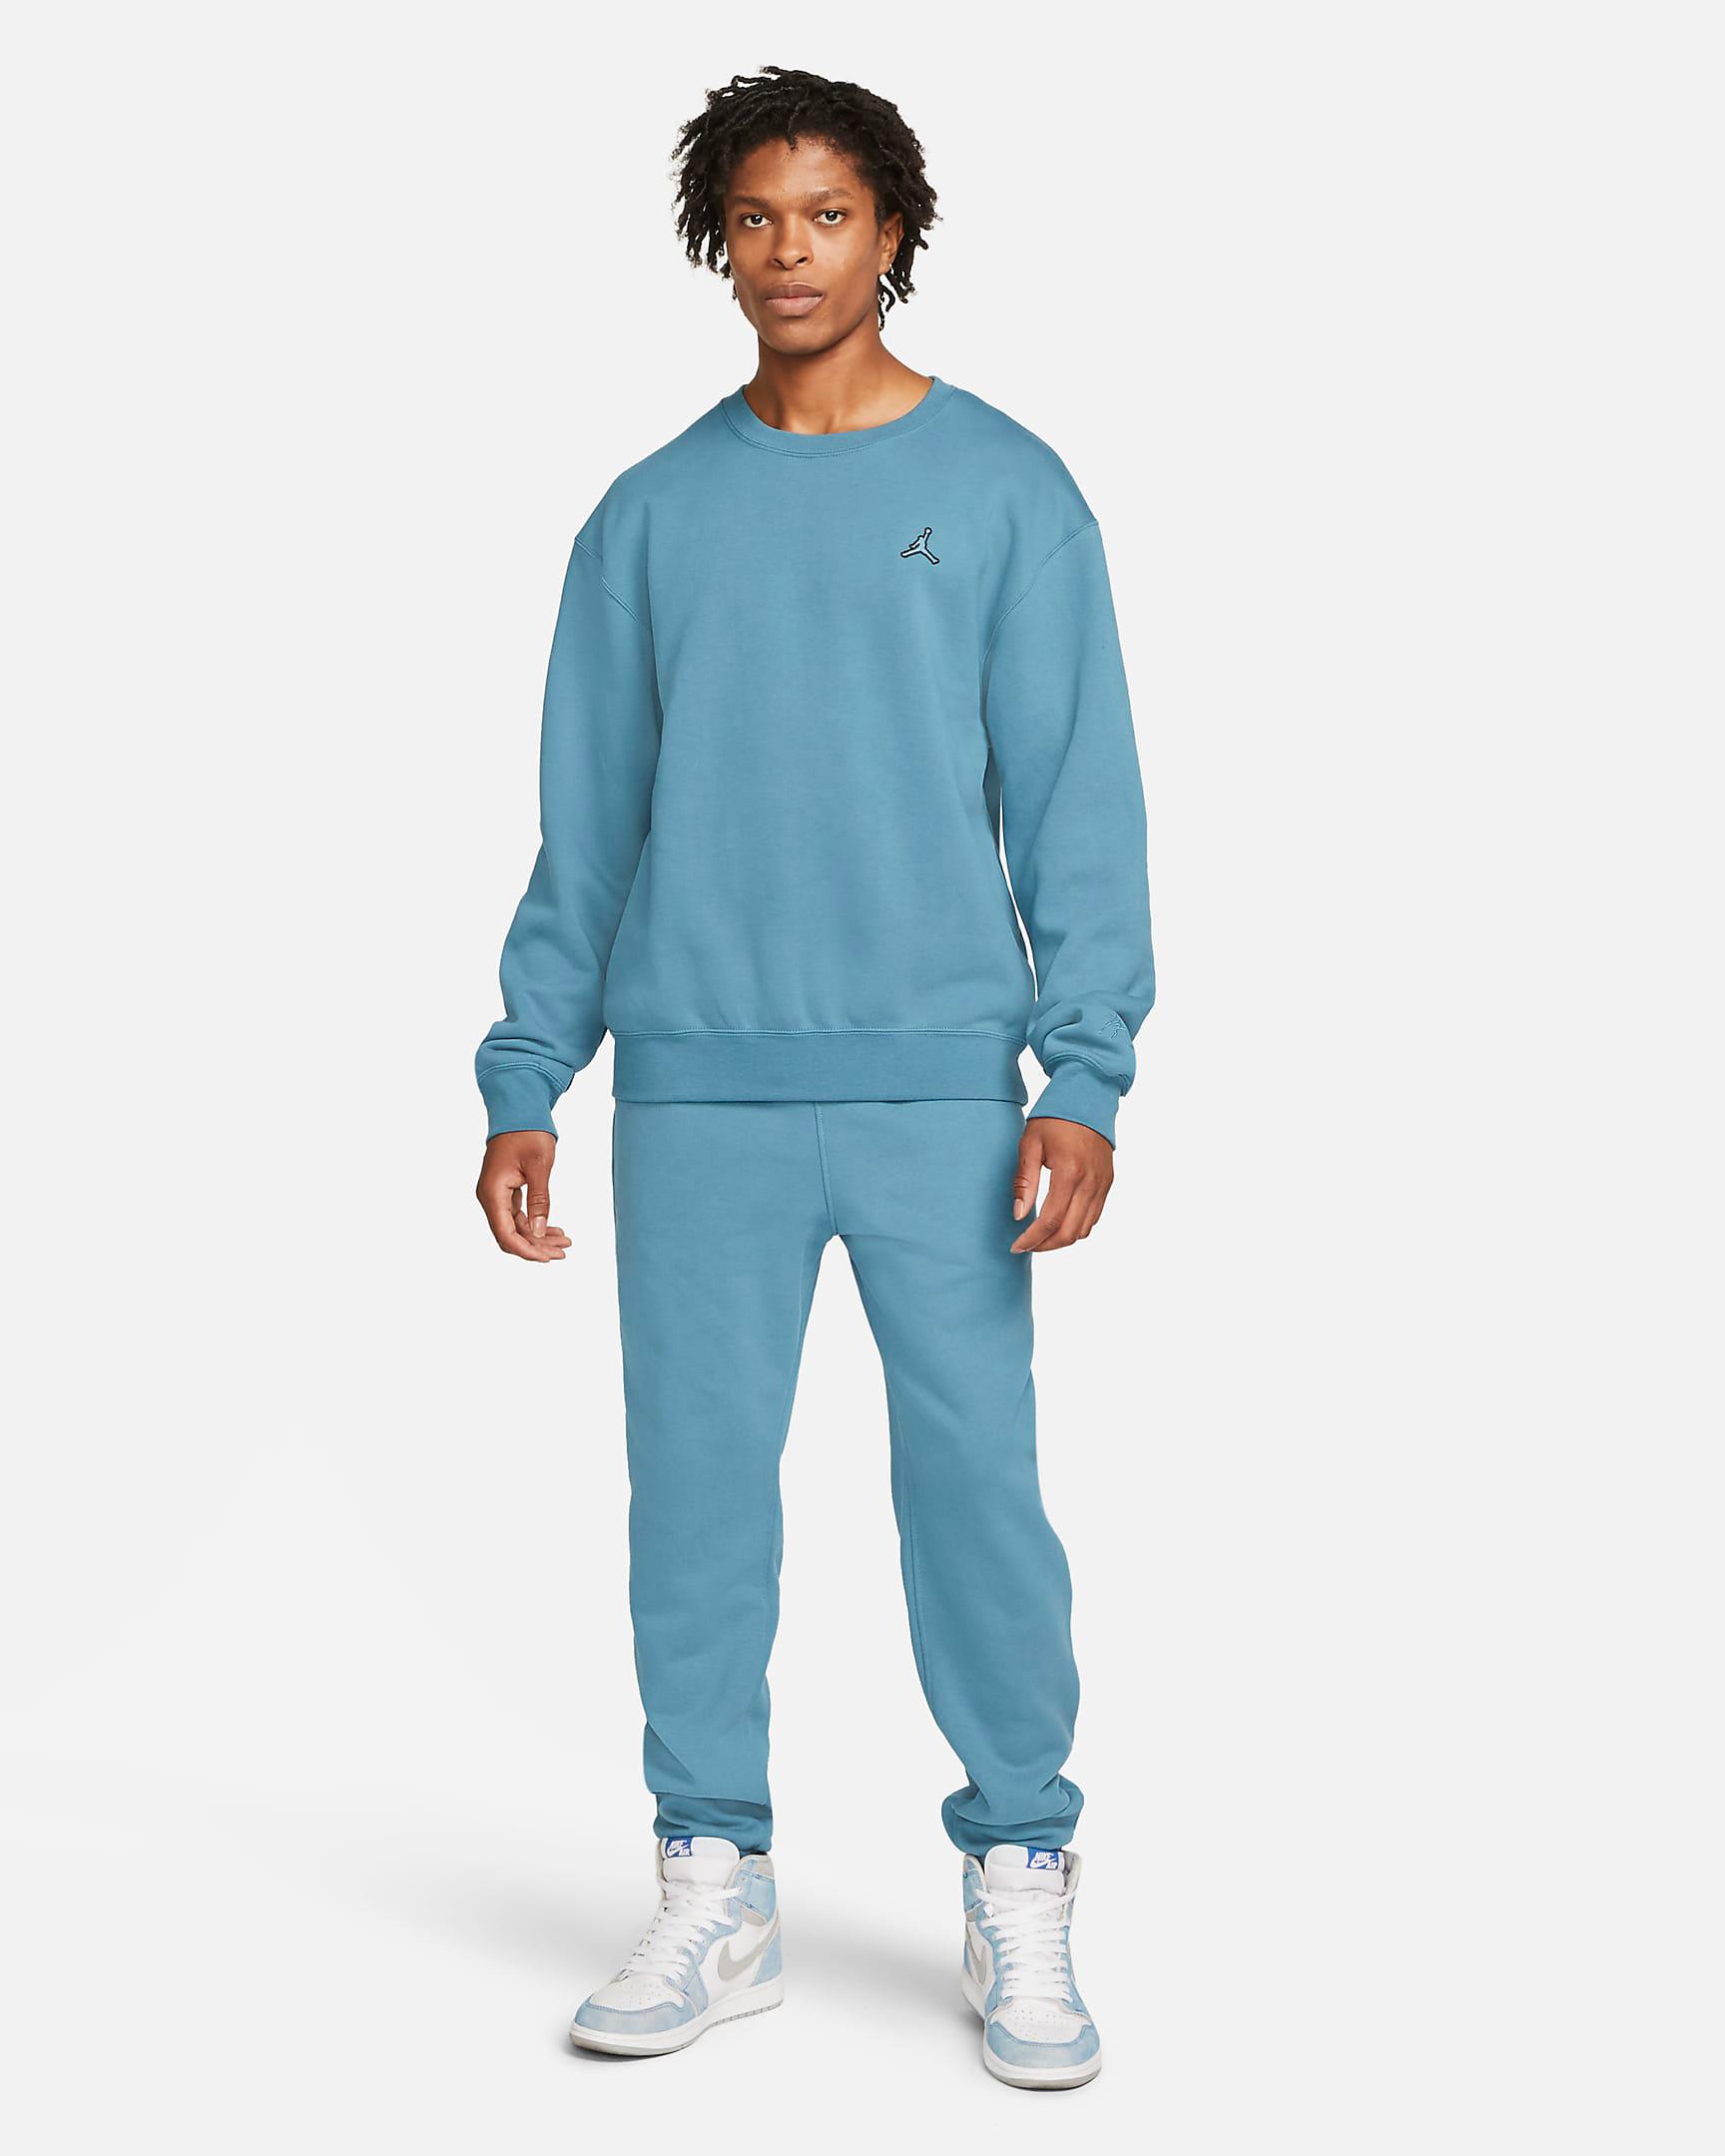 jordan-rift-blue-sweatshirt-pants-outfit